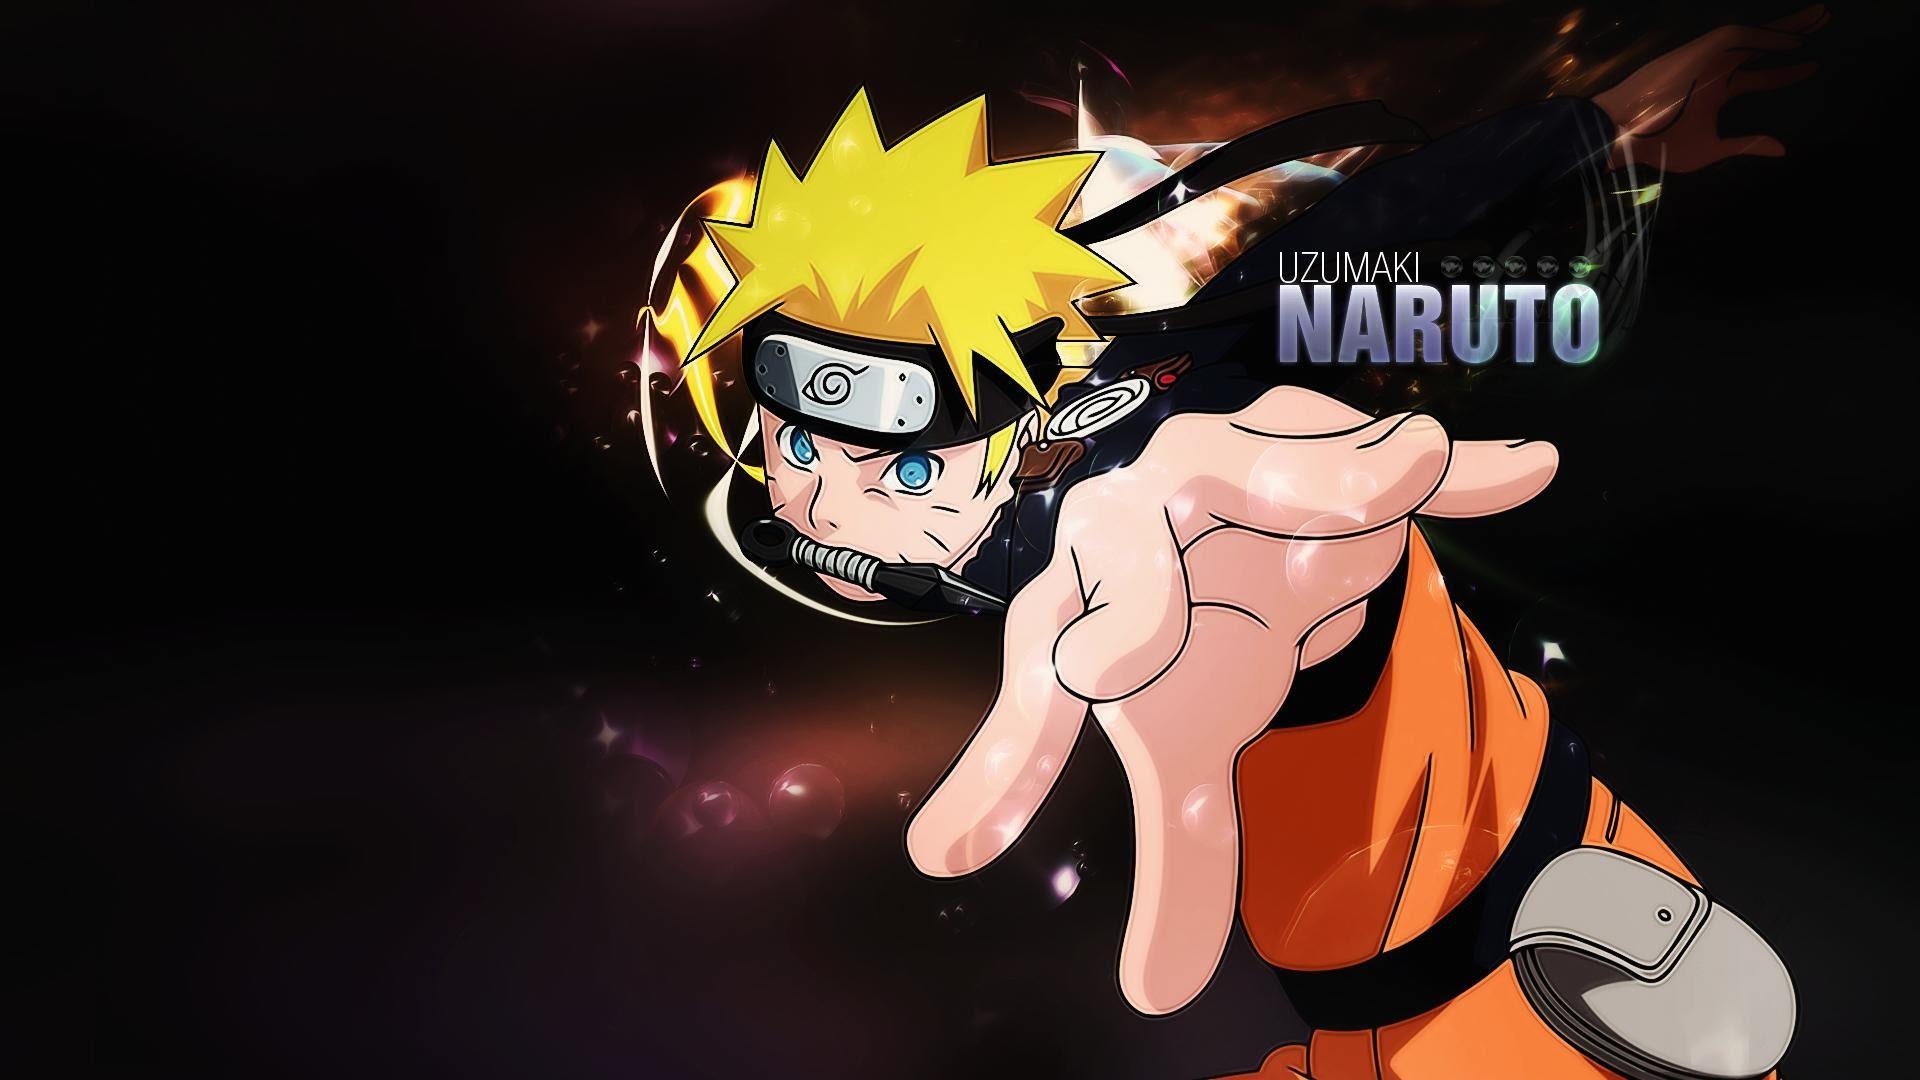 Wallpaper Naruto Shippuden 3d